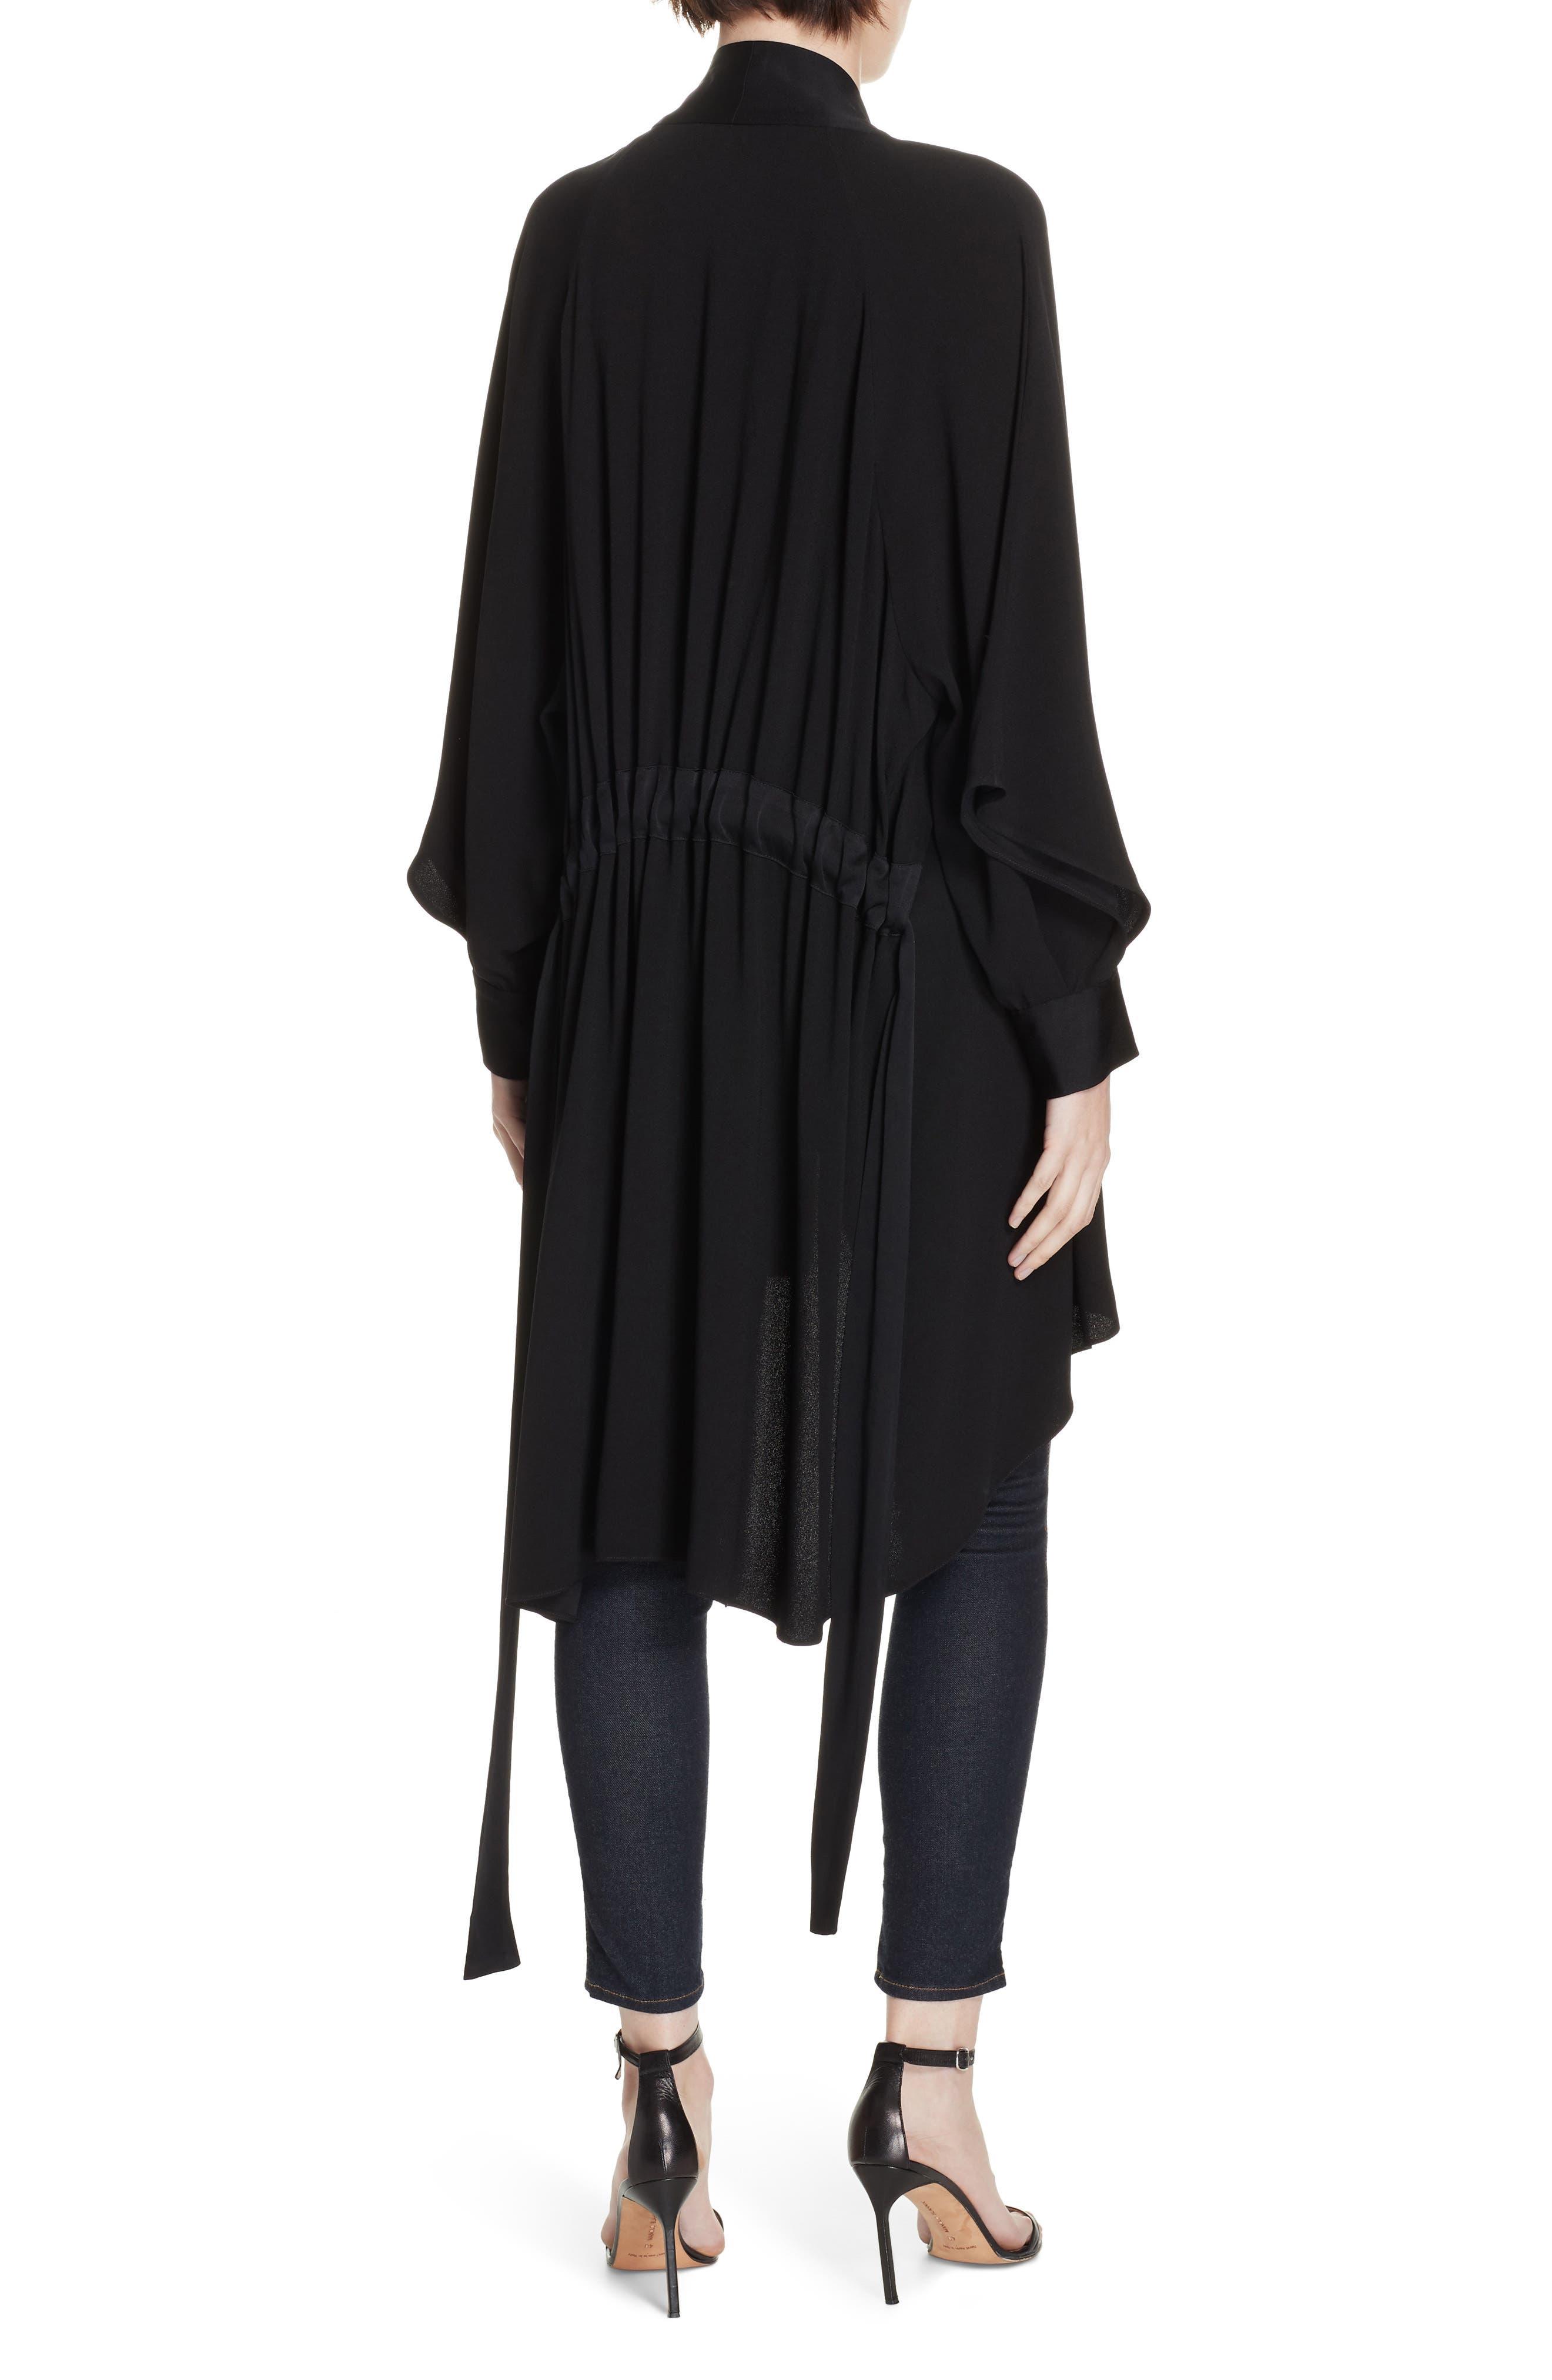 Deon Kimono Wrap,                             Alternate thumbnail 3, color,                             BLACK